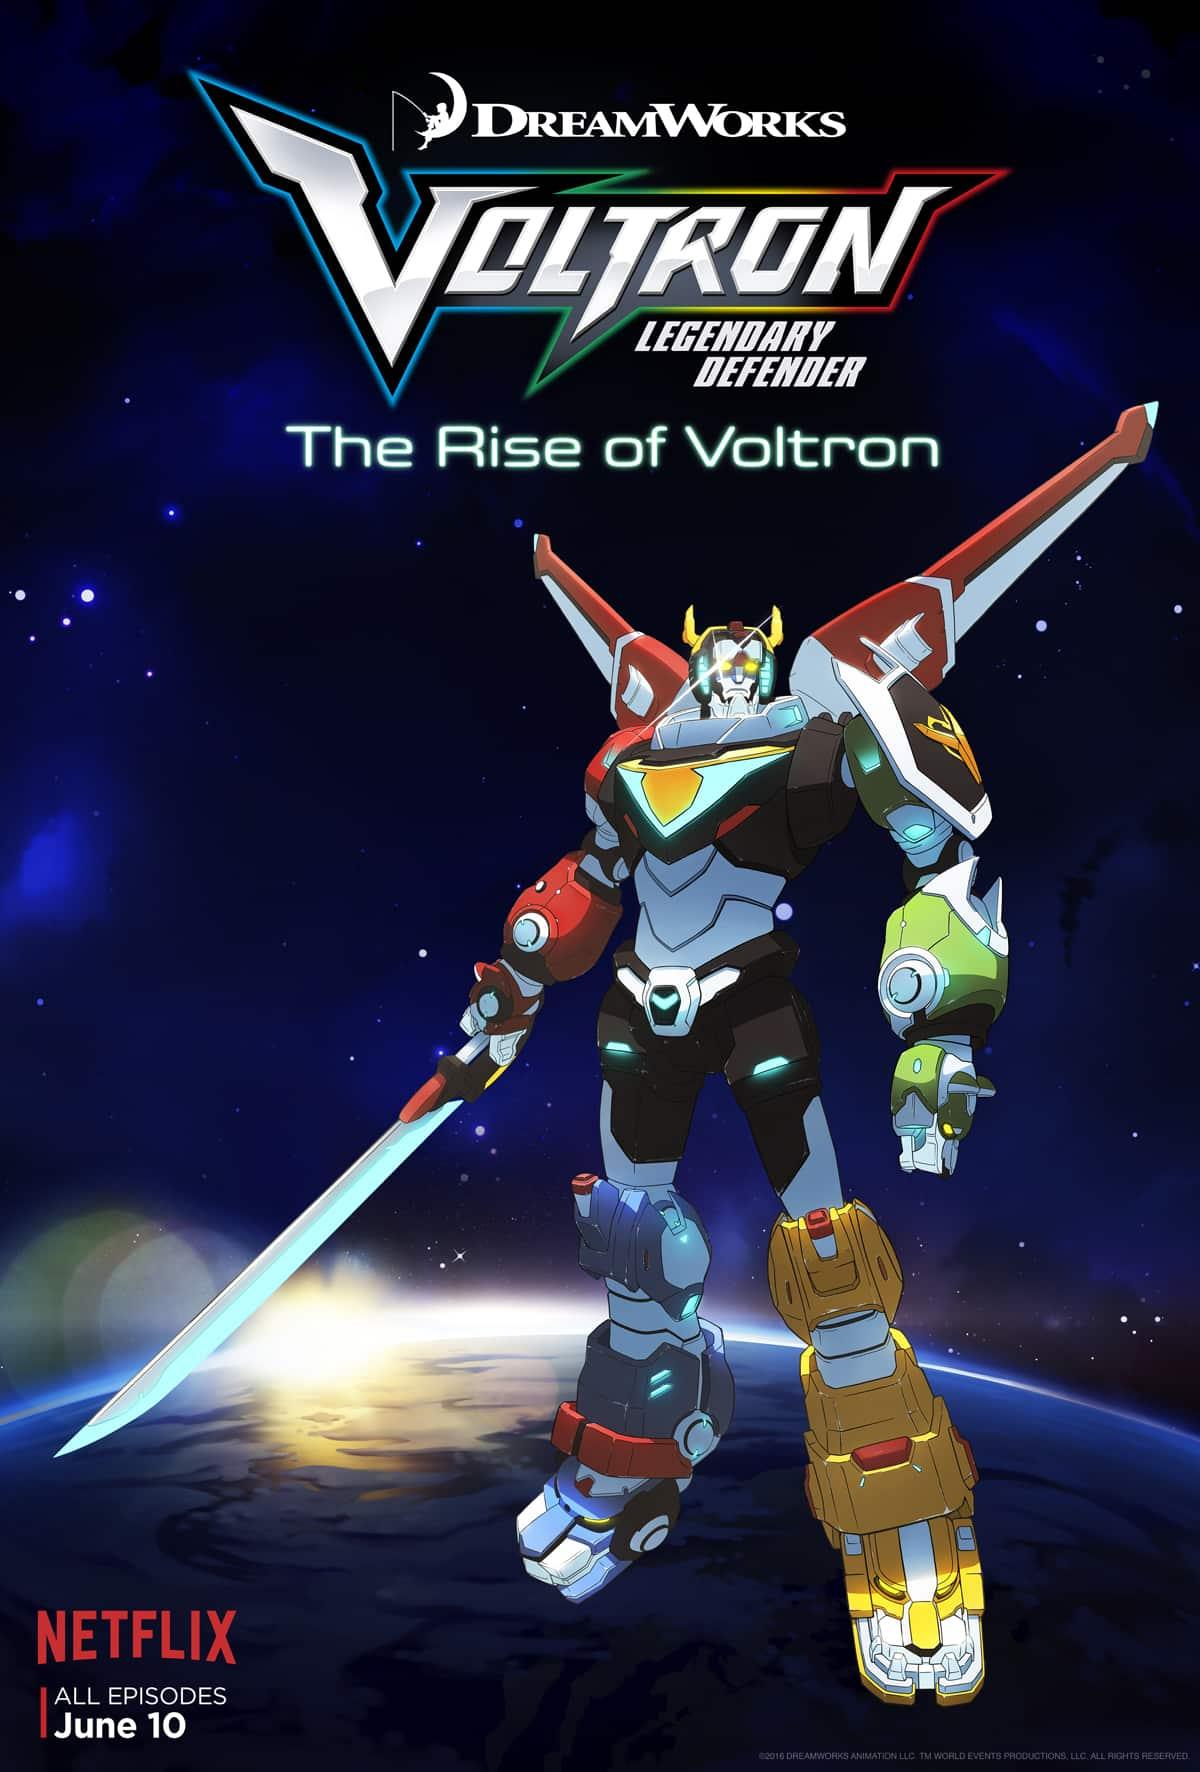 Voltron on Netflix Poster